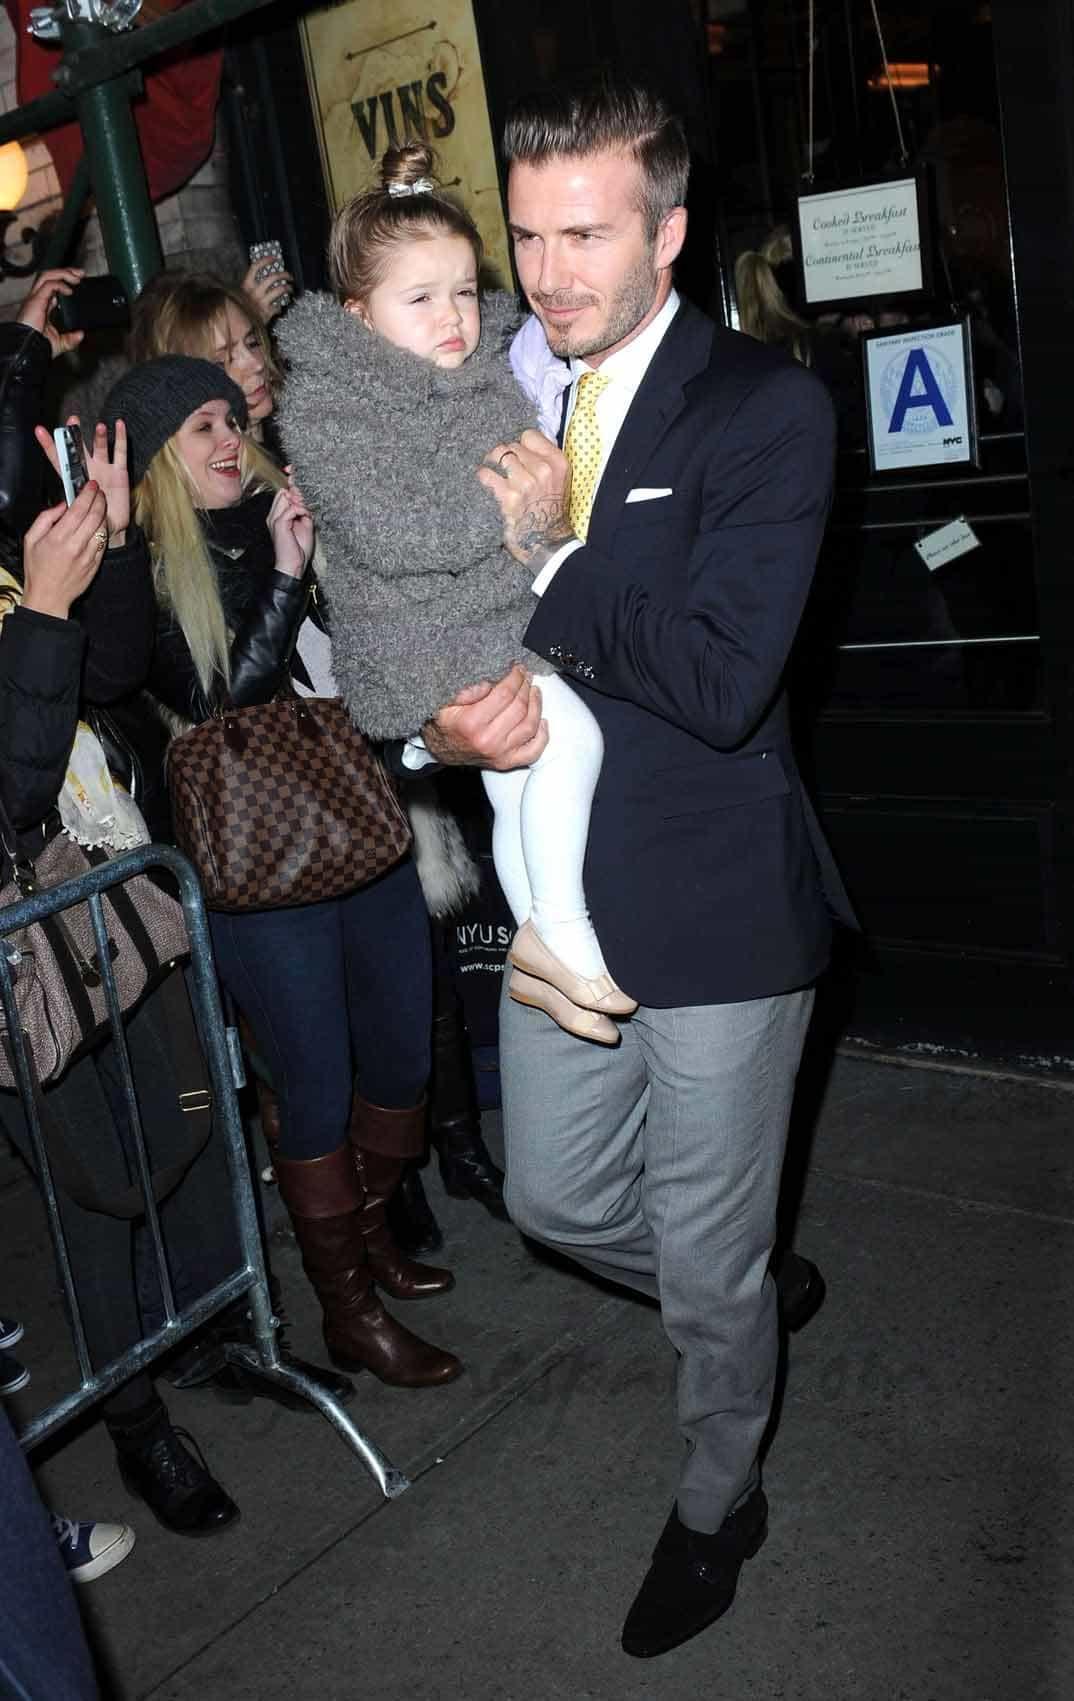 David-Beckham-y-su-hija